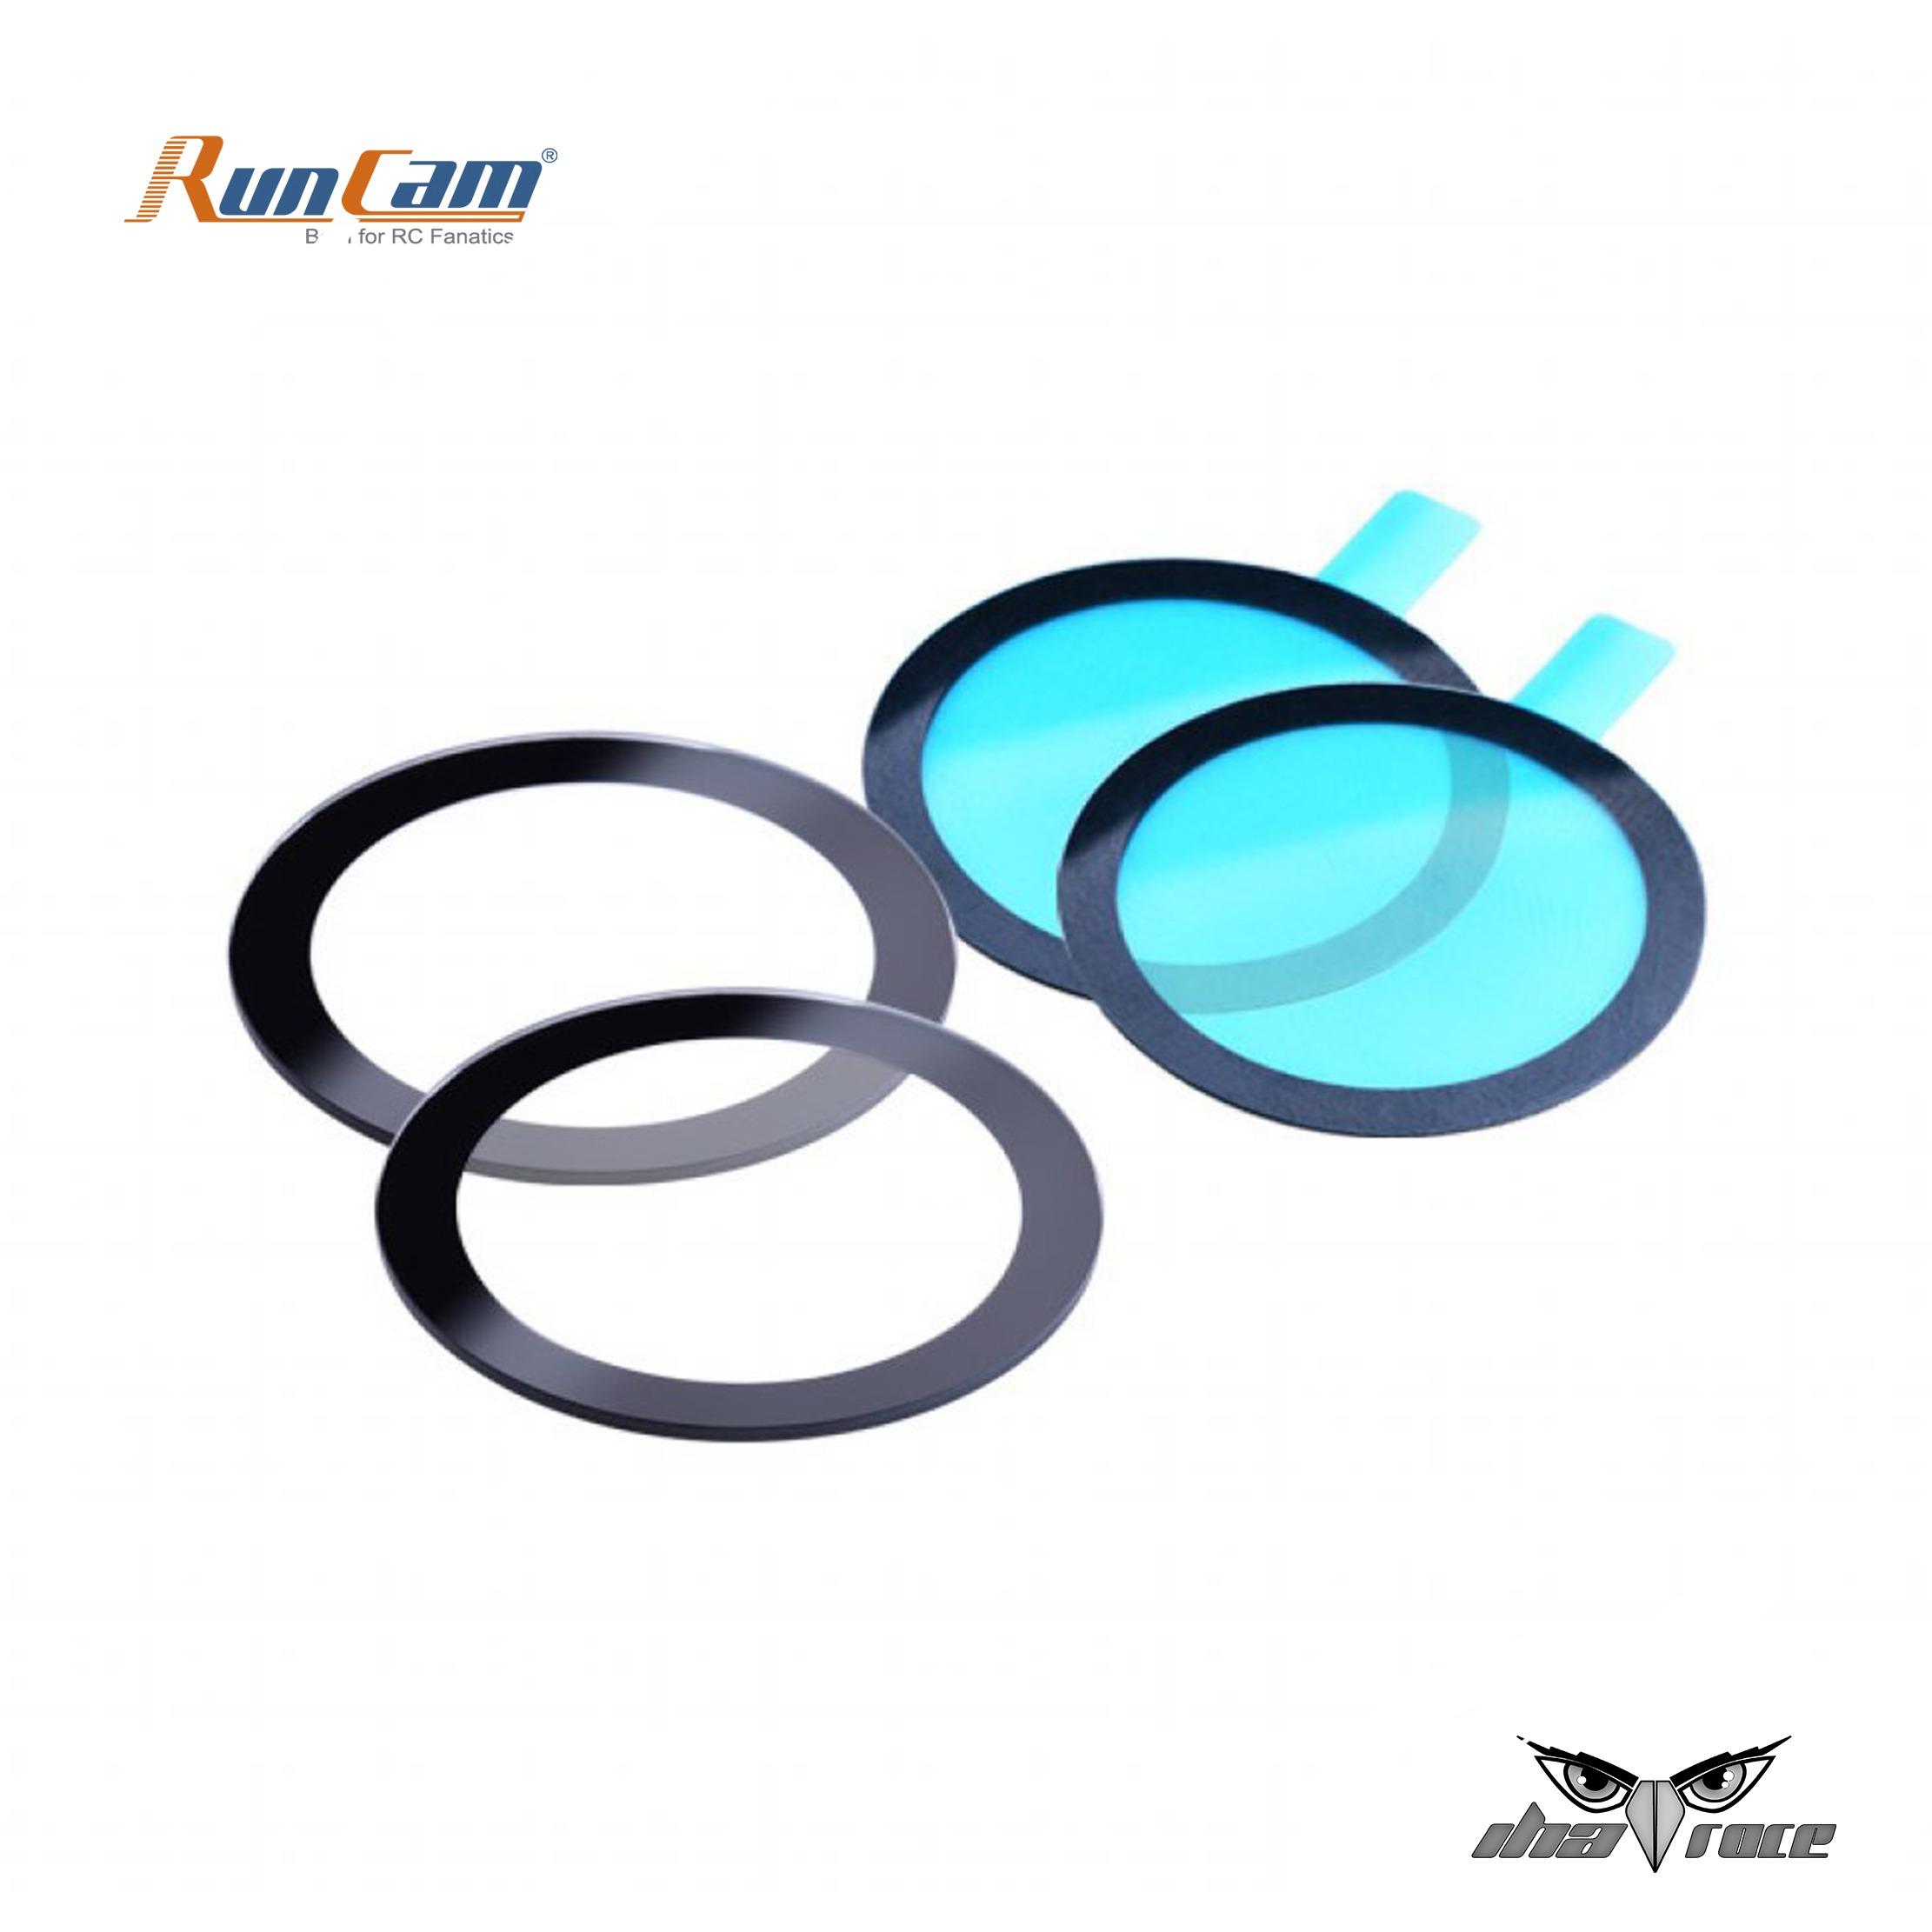 Protector de vidrio templado para RunCam 3S